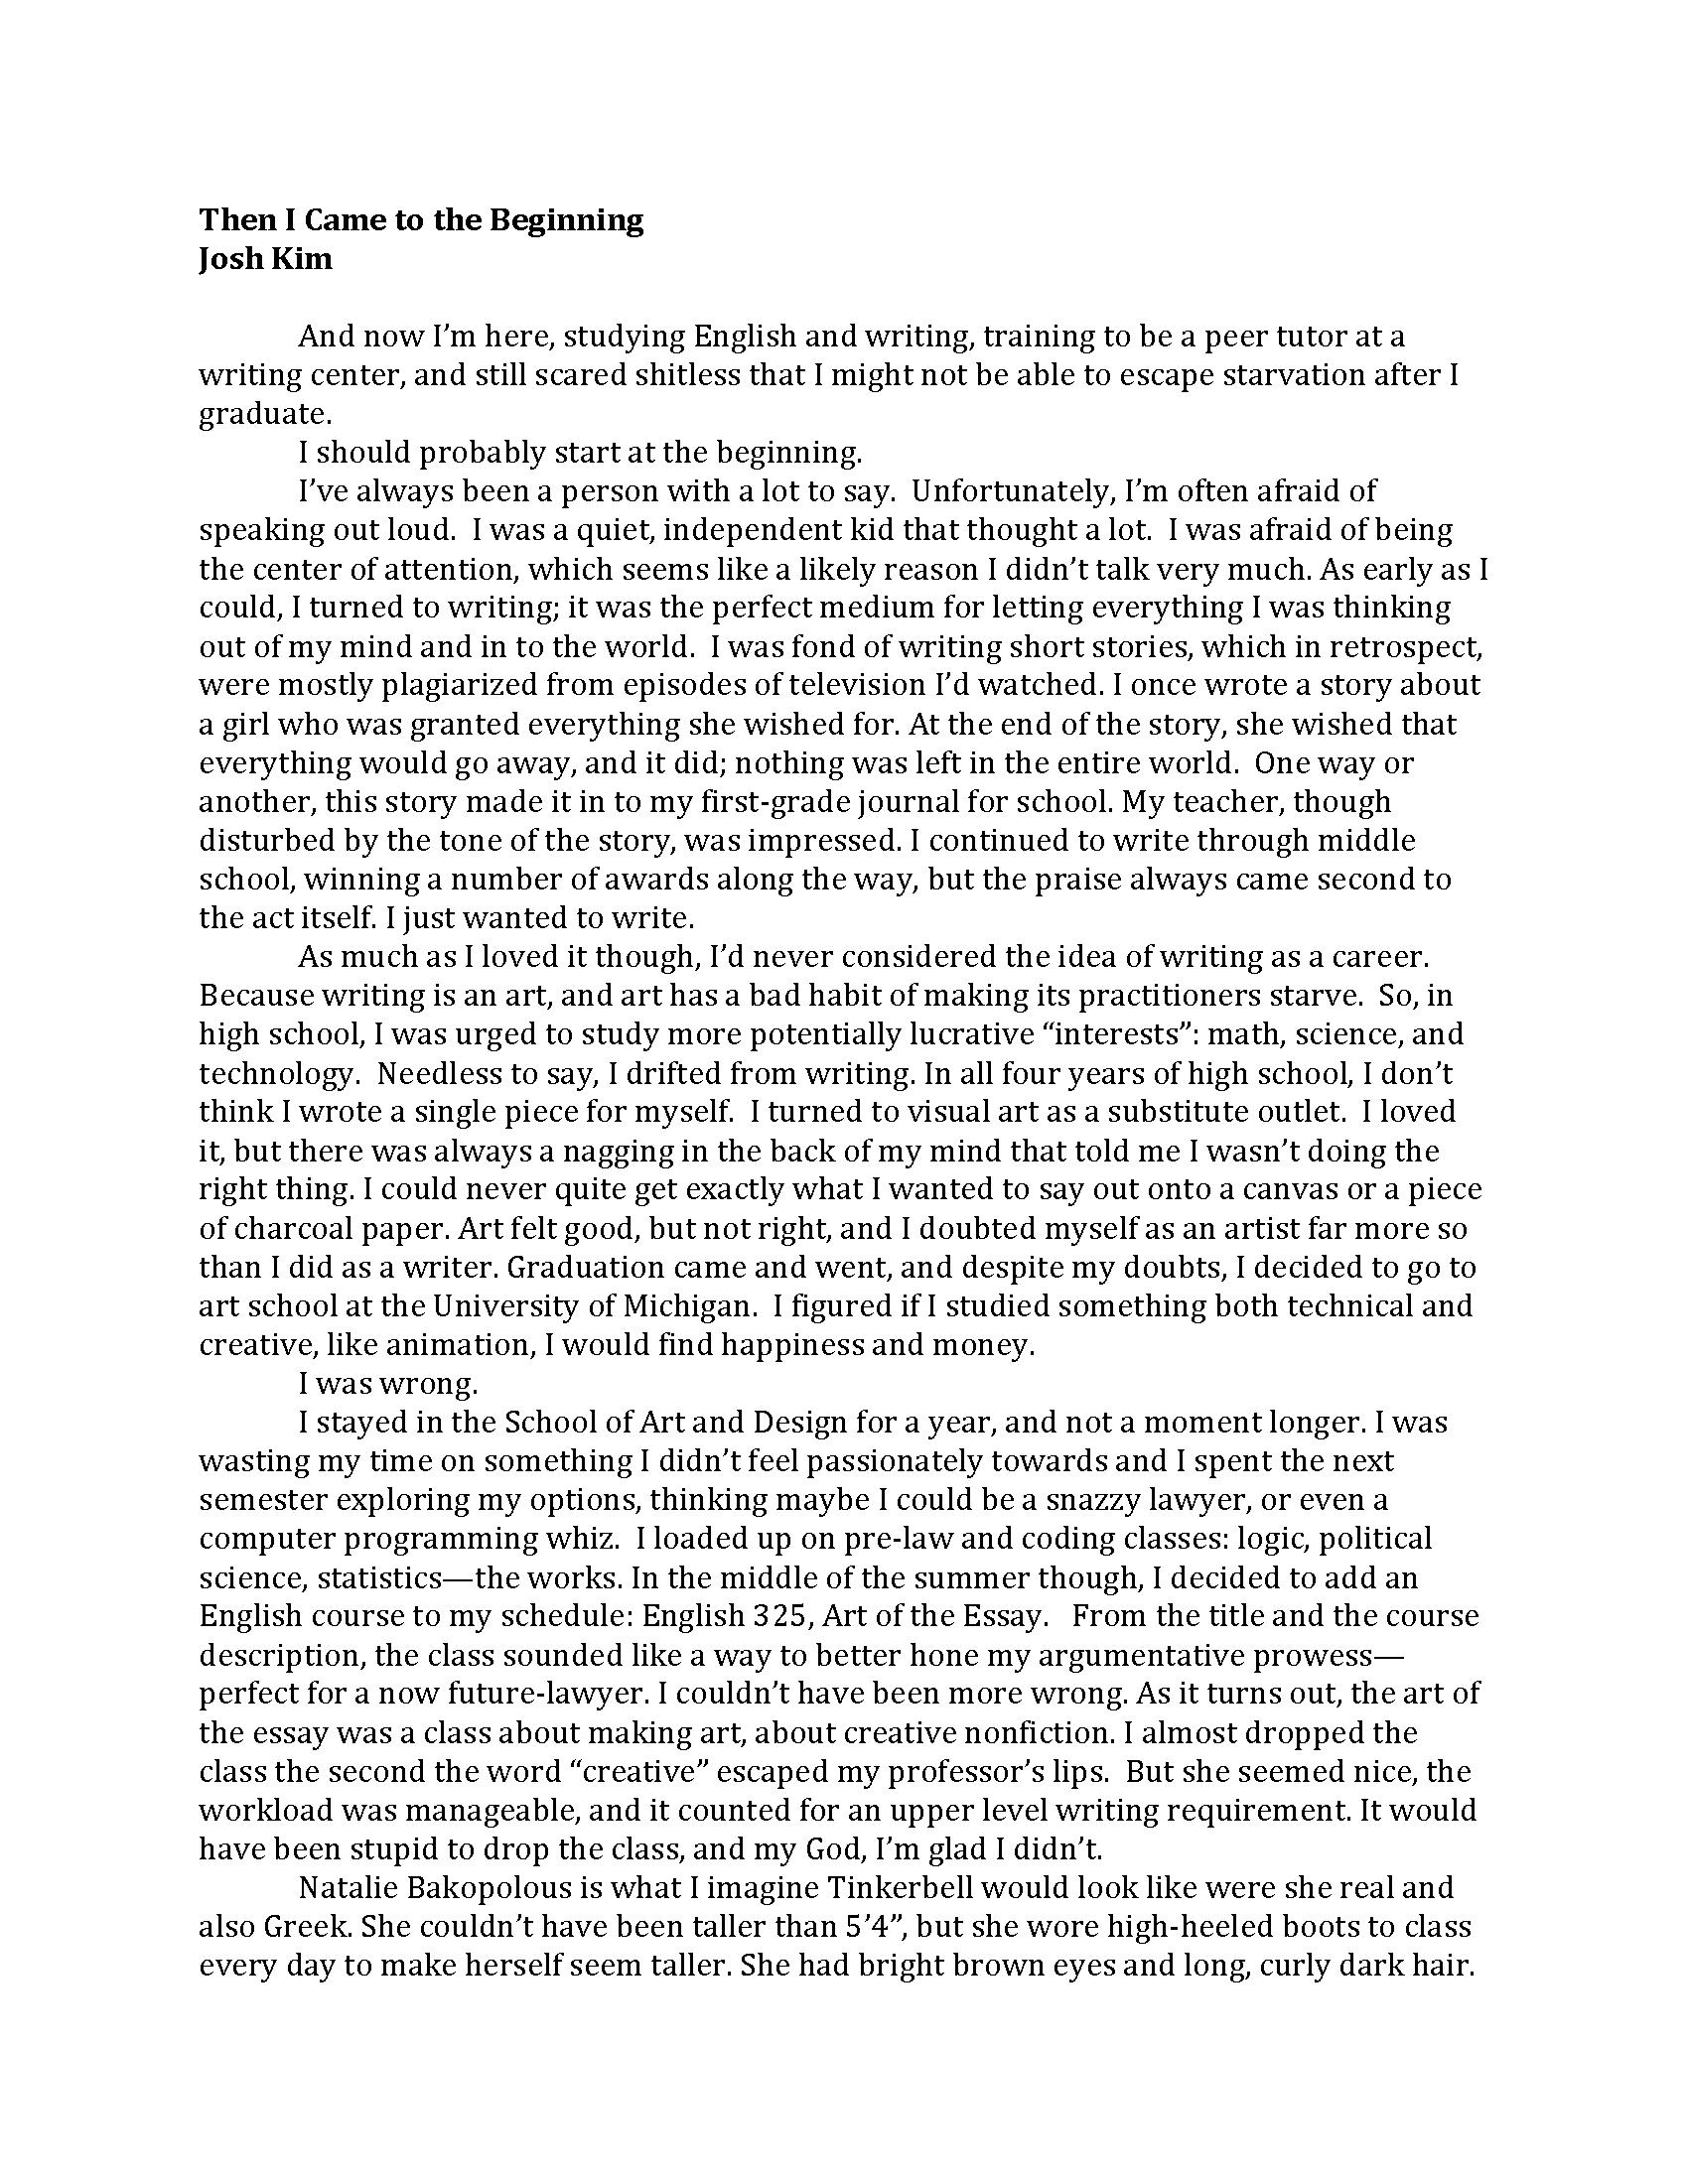 General essay topics in english